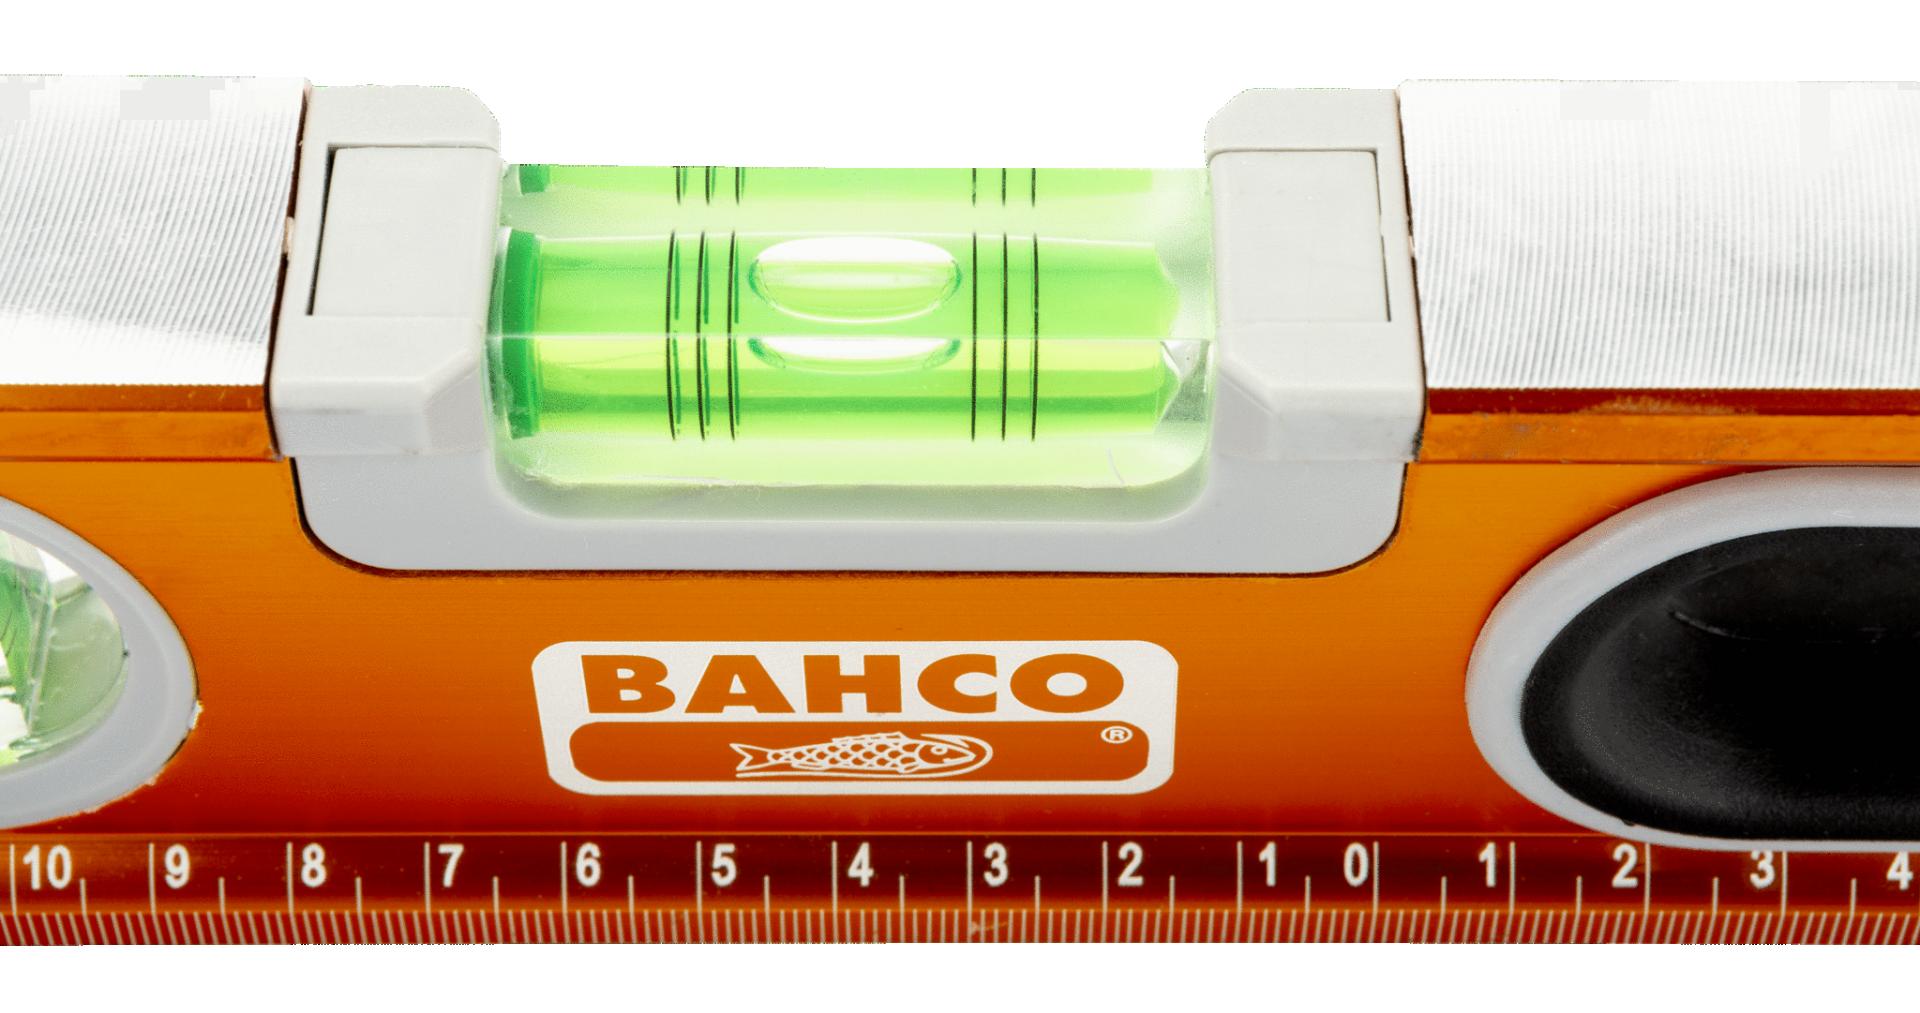 Poziomica 400 mm aluminiowa, anodowana Bahco (nr kat. 466-400)